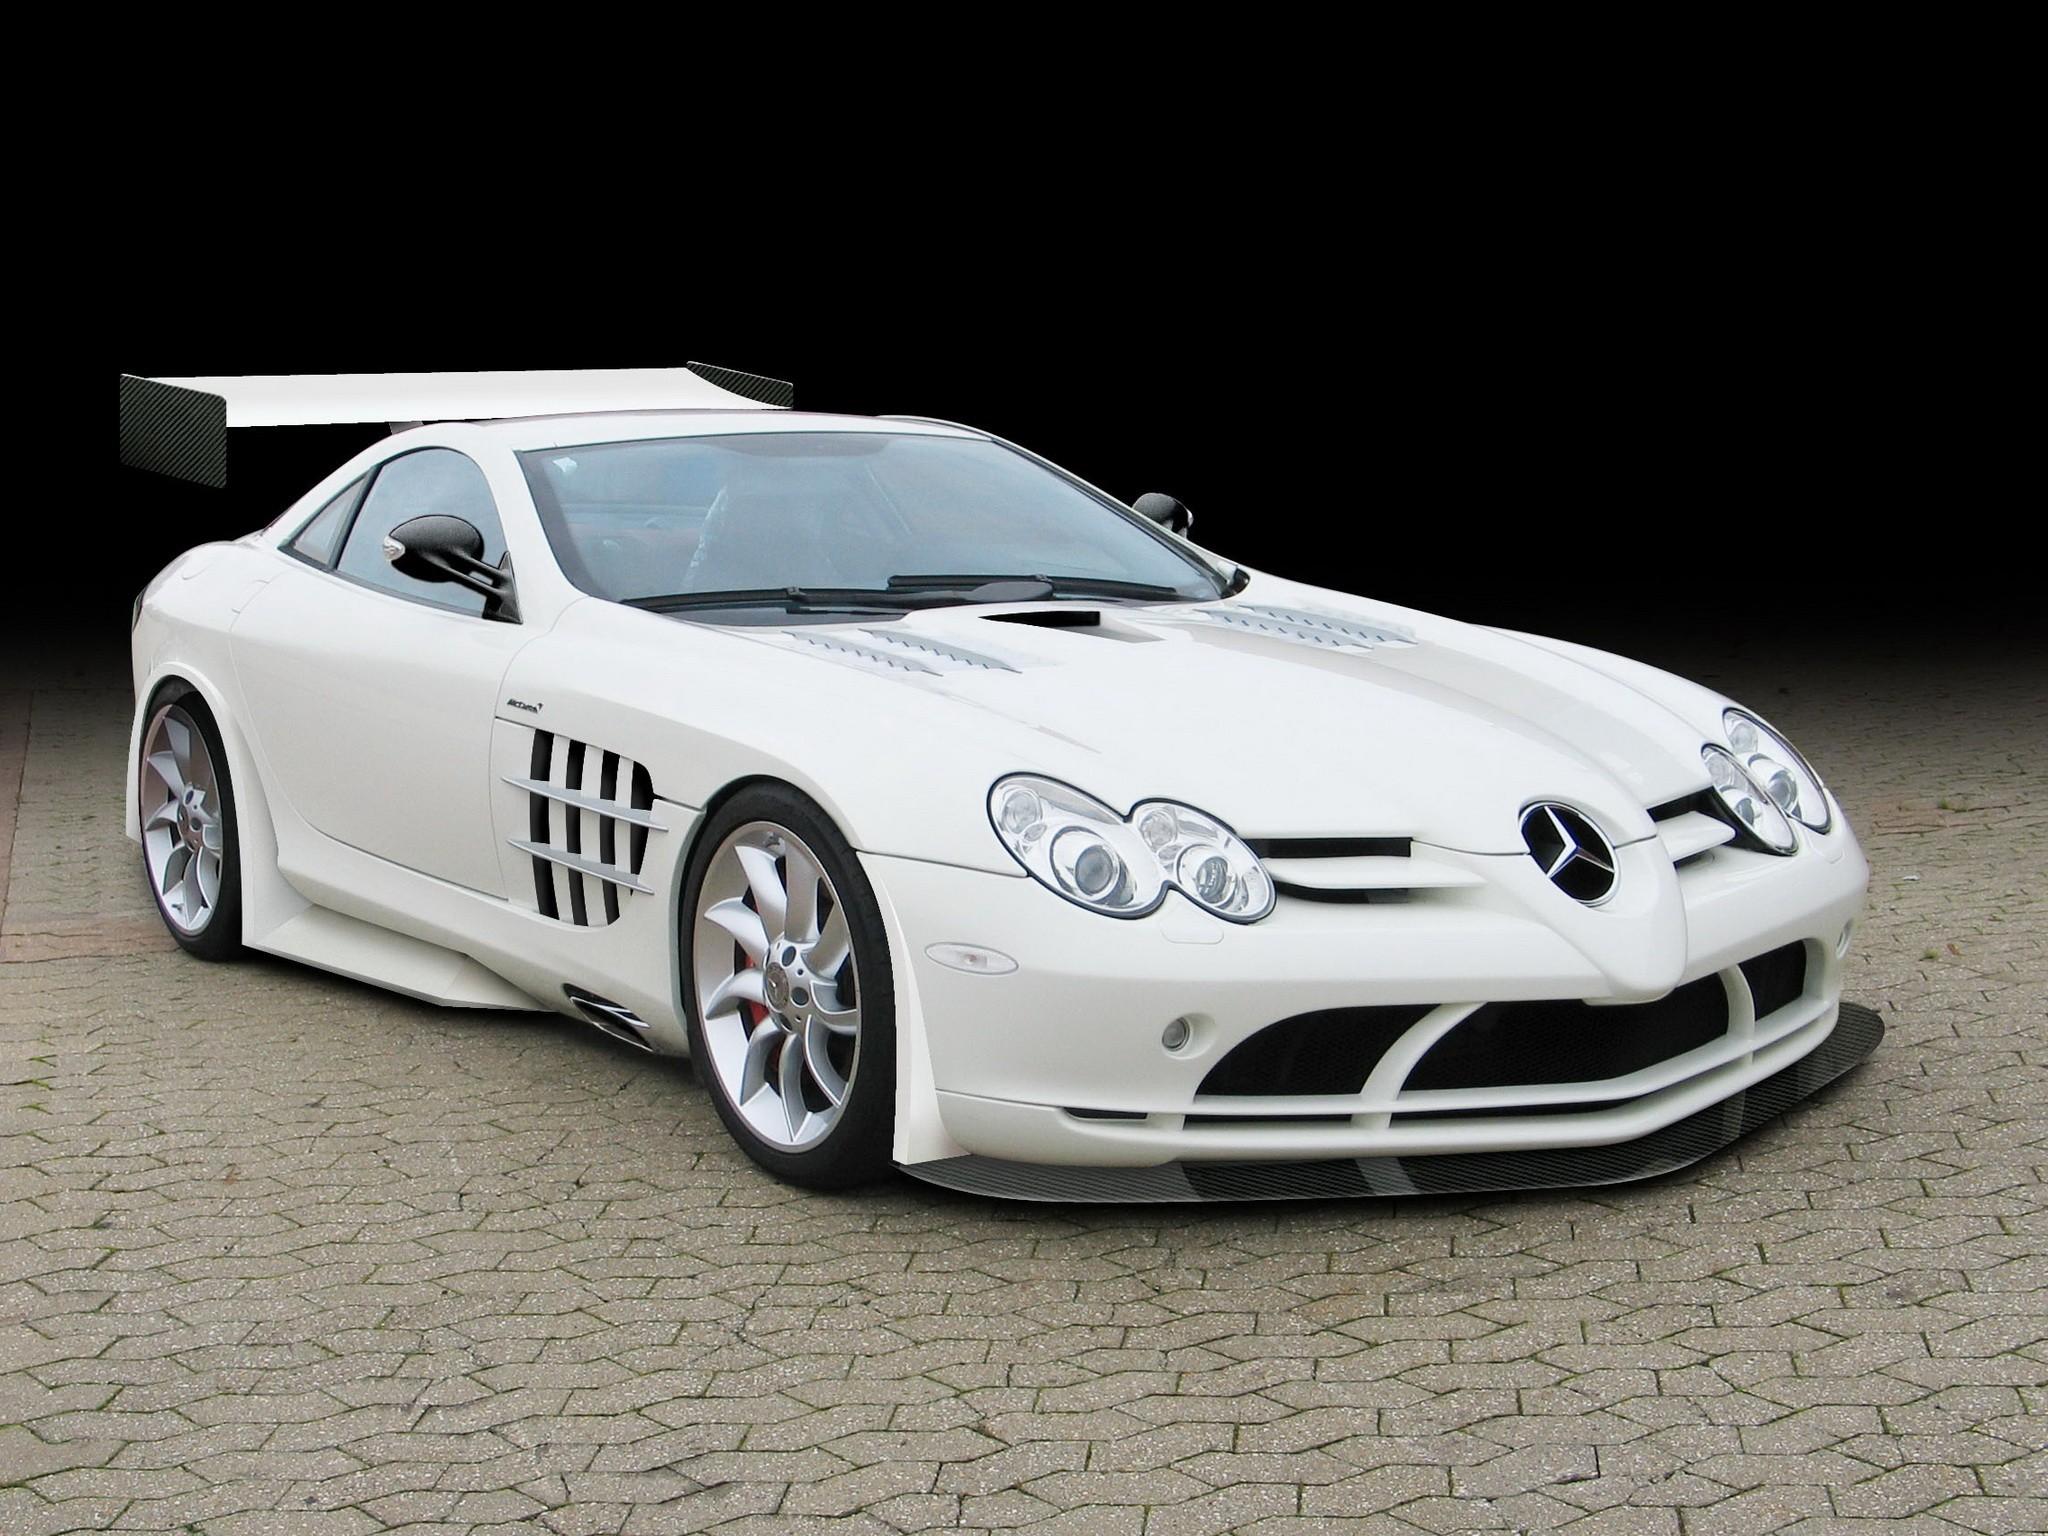 Cars Supercars Wallpaper 2048x1536 Cars Supercars Mercedes Benz 2048x1536